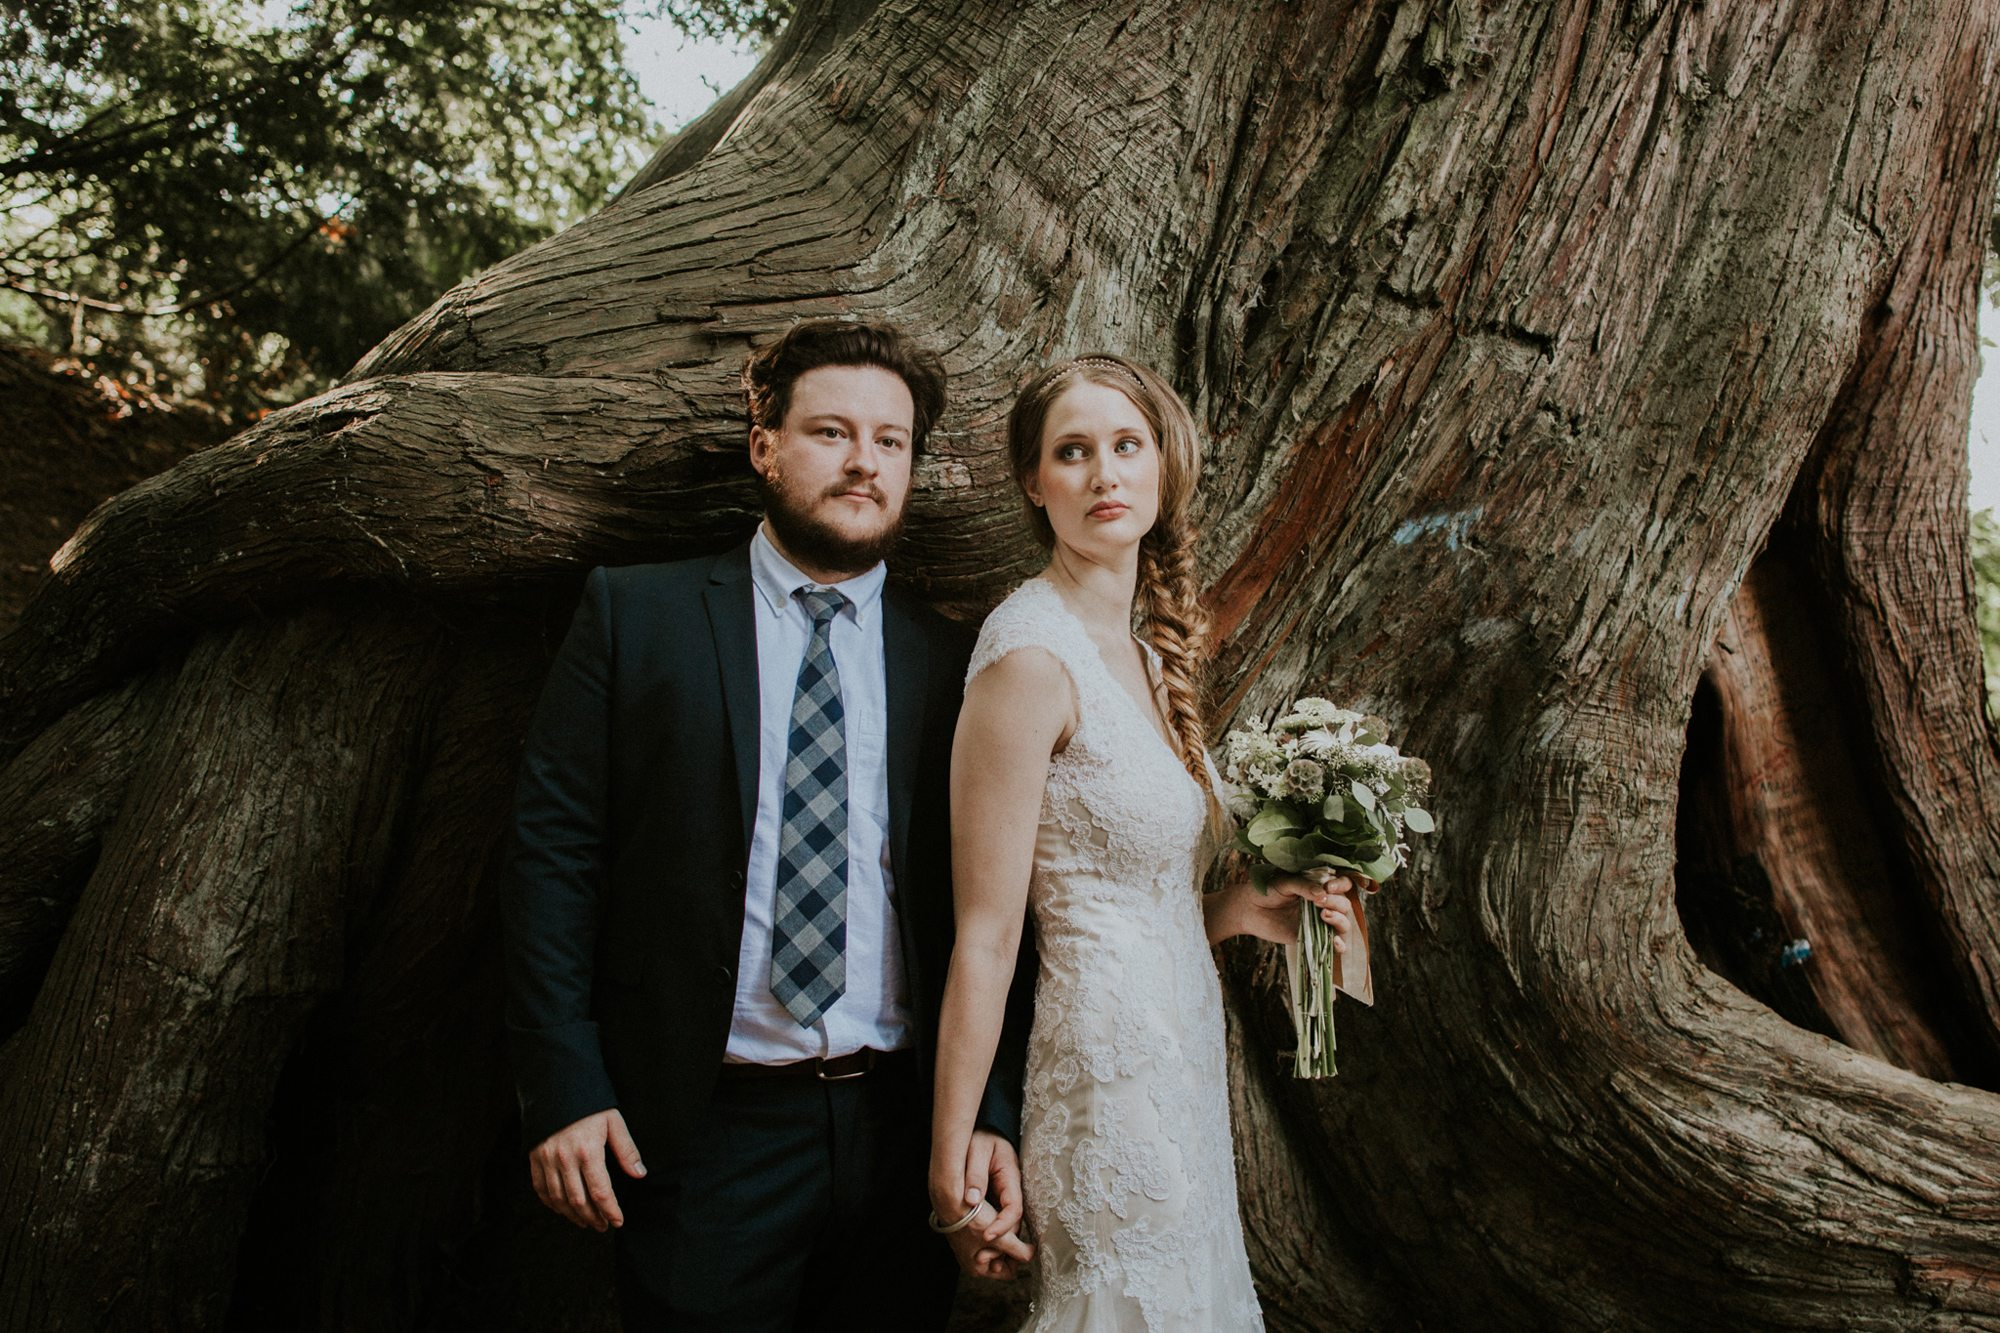 862-abbotsford-wedding-photographer